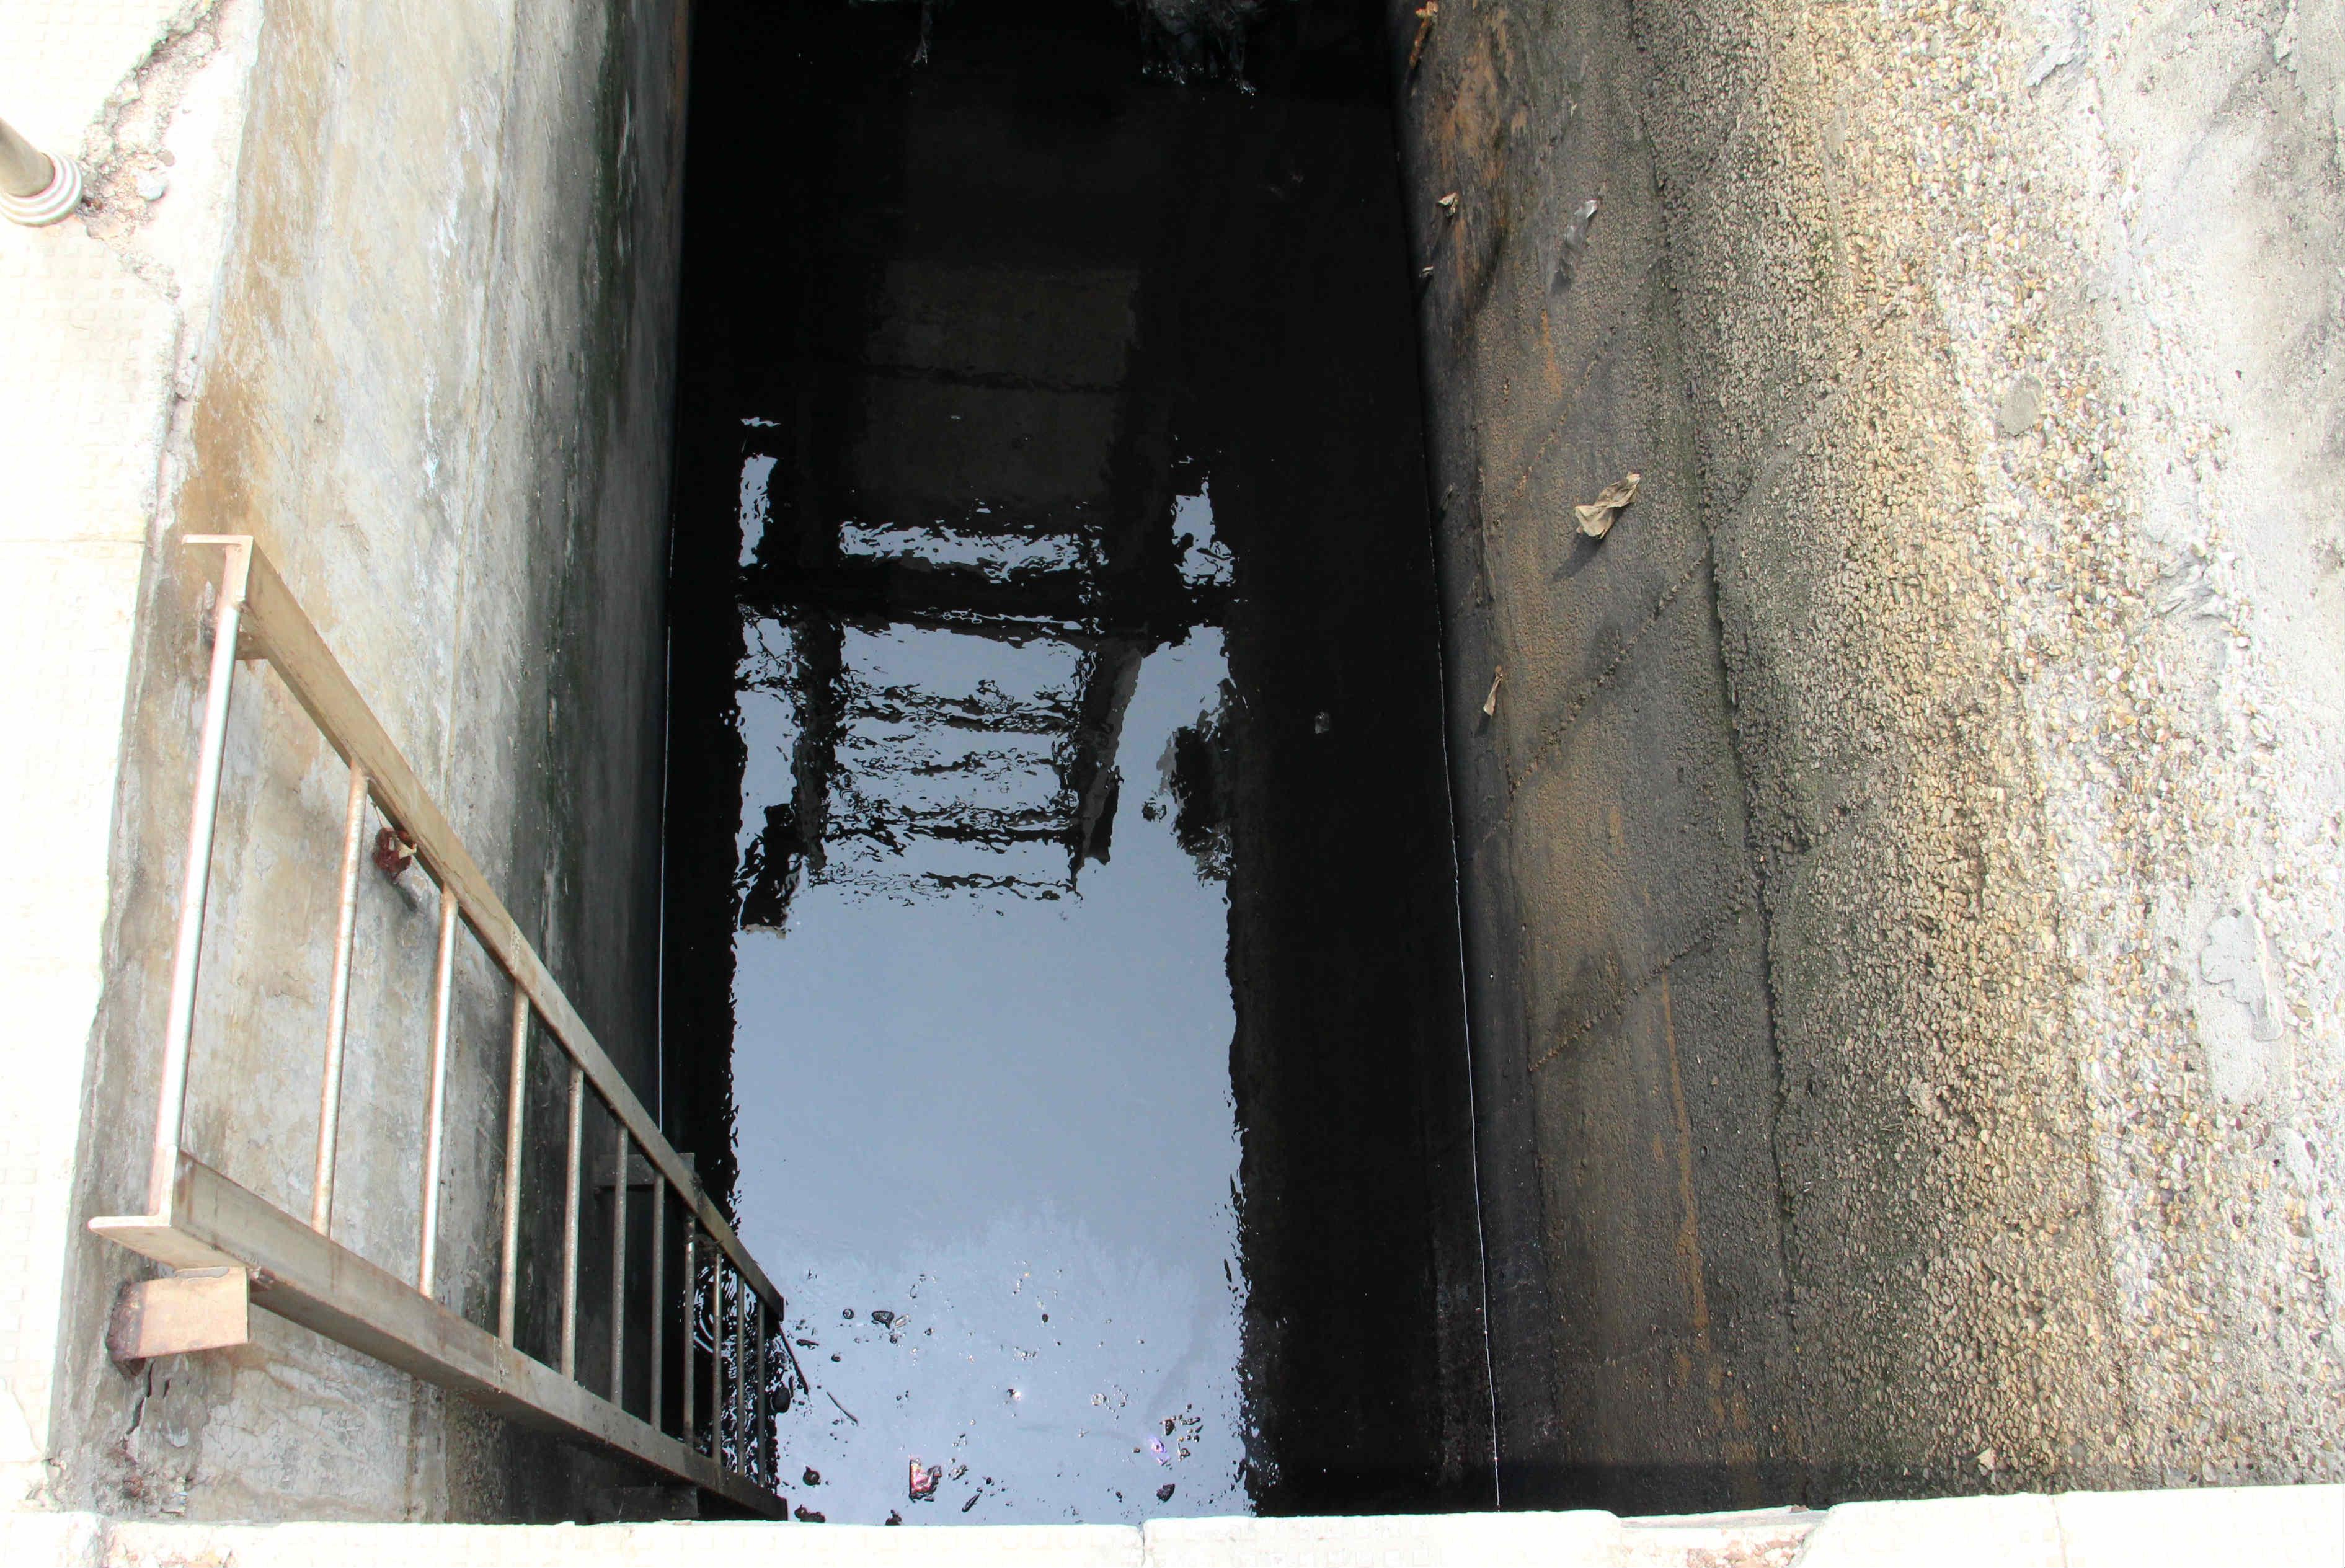 The sewage tank where the three men choked to death. Photo credit: Aabid Shafi